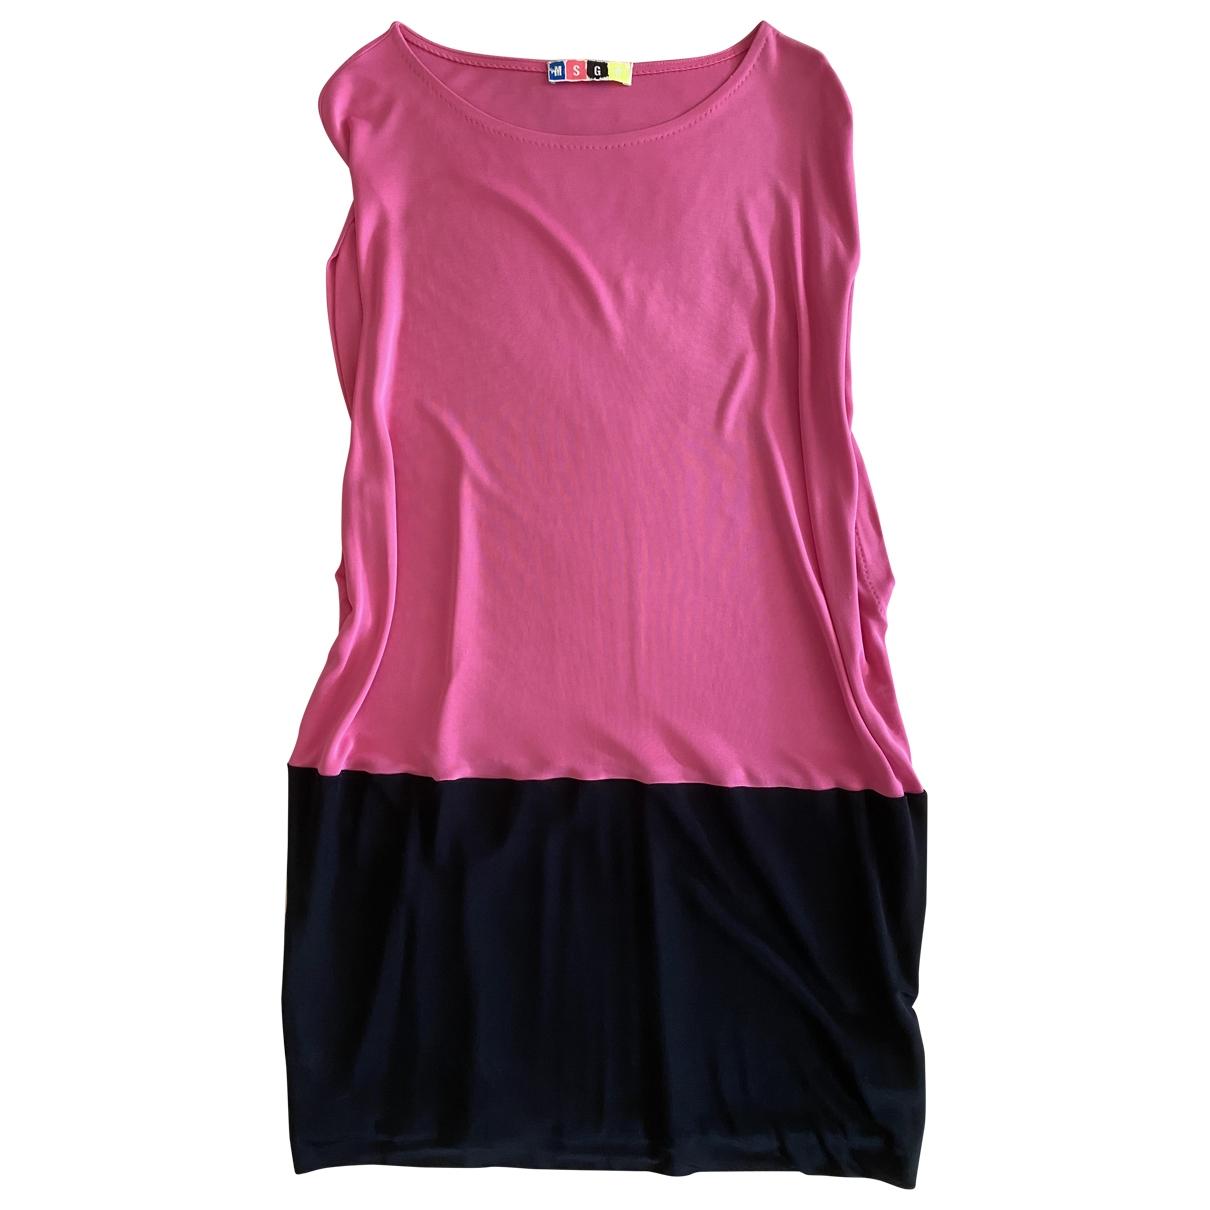 Msgm \N Kleid in  Rosa Polyester